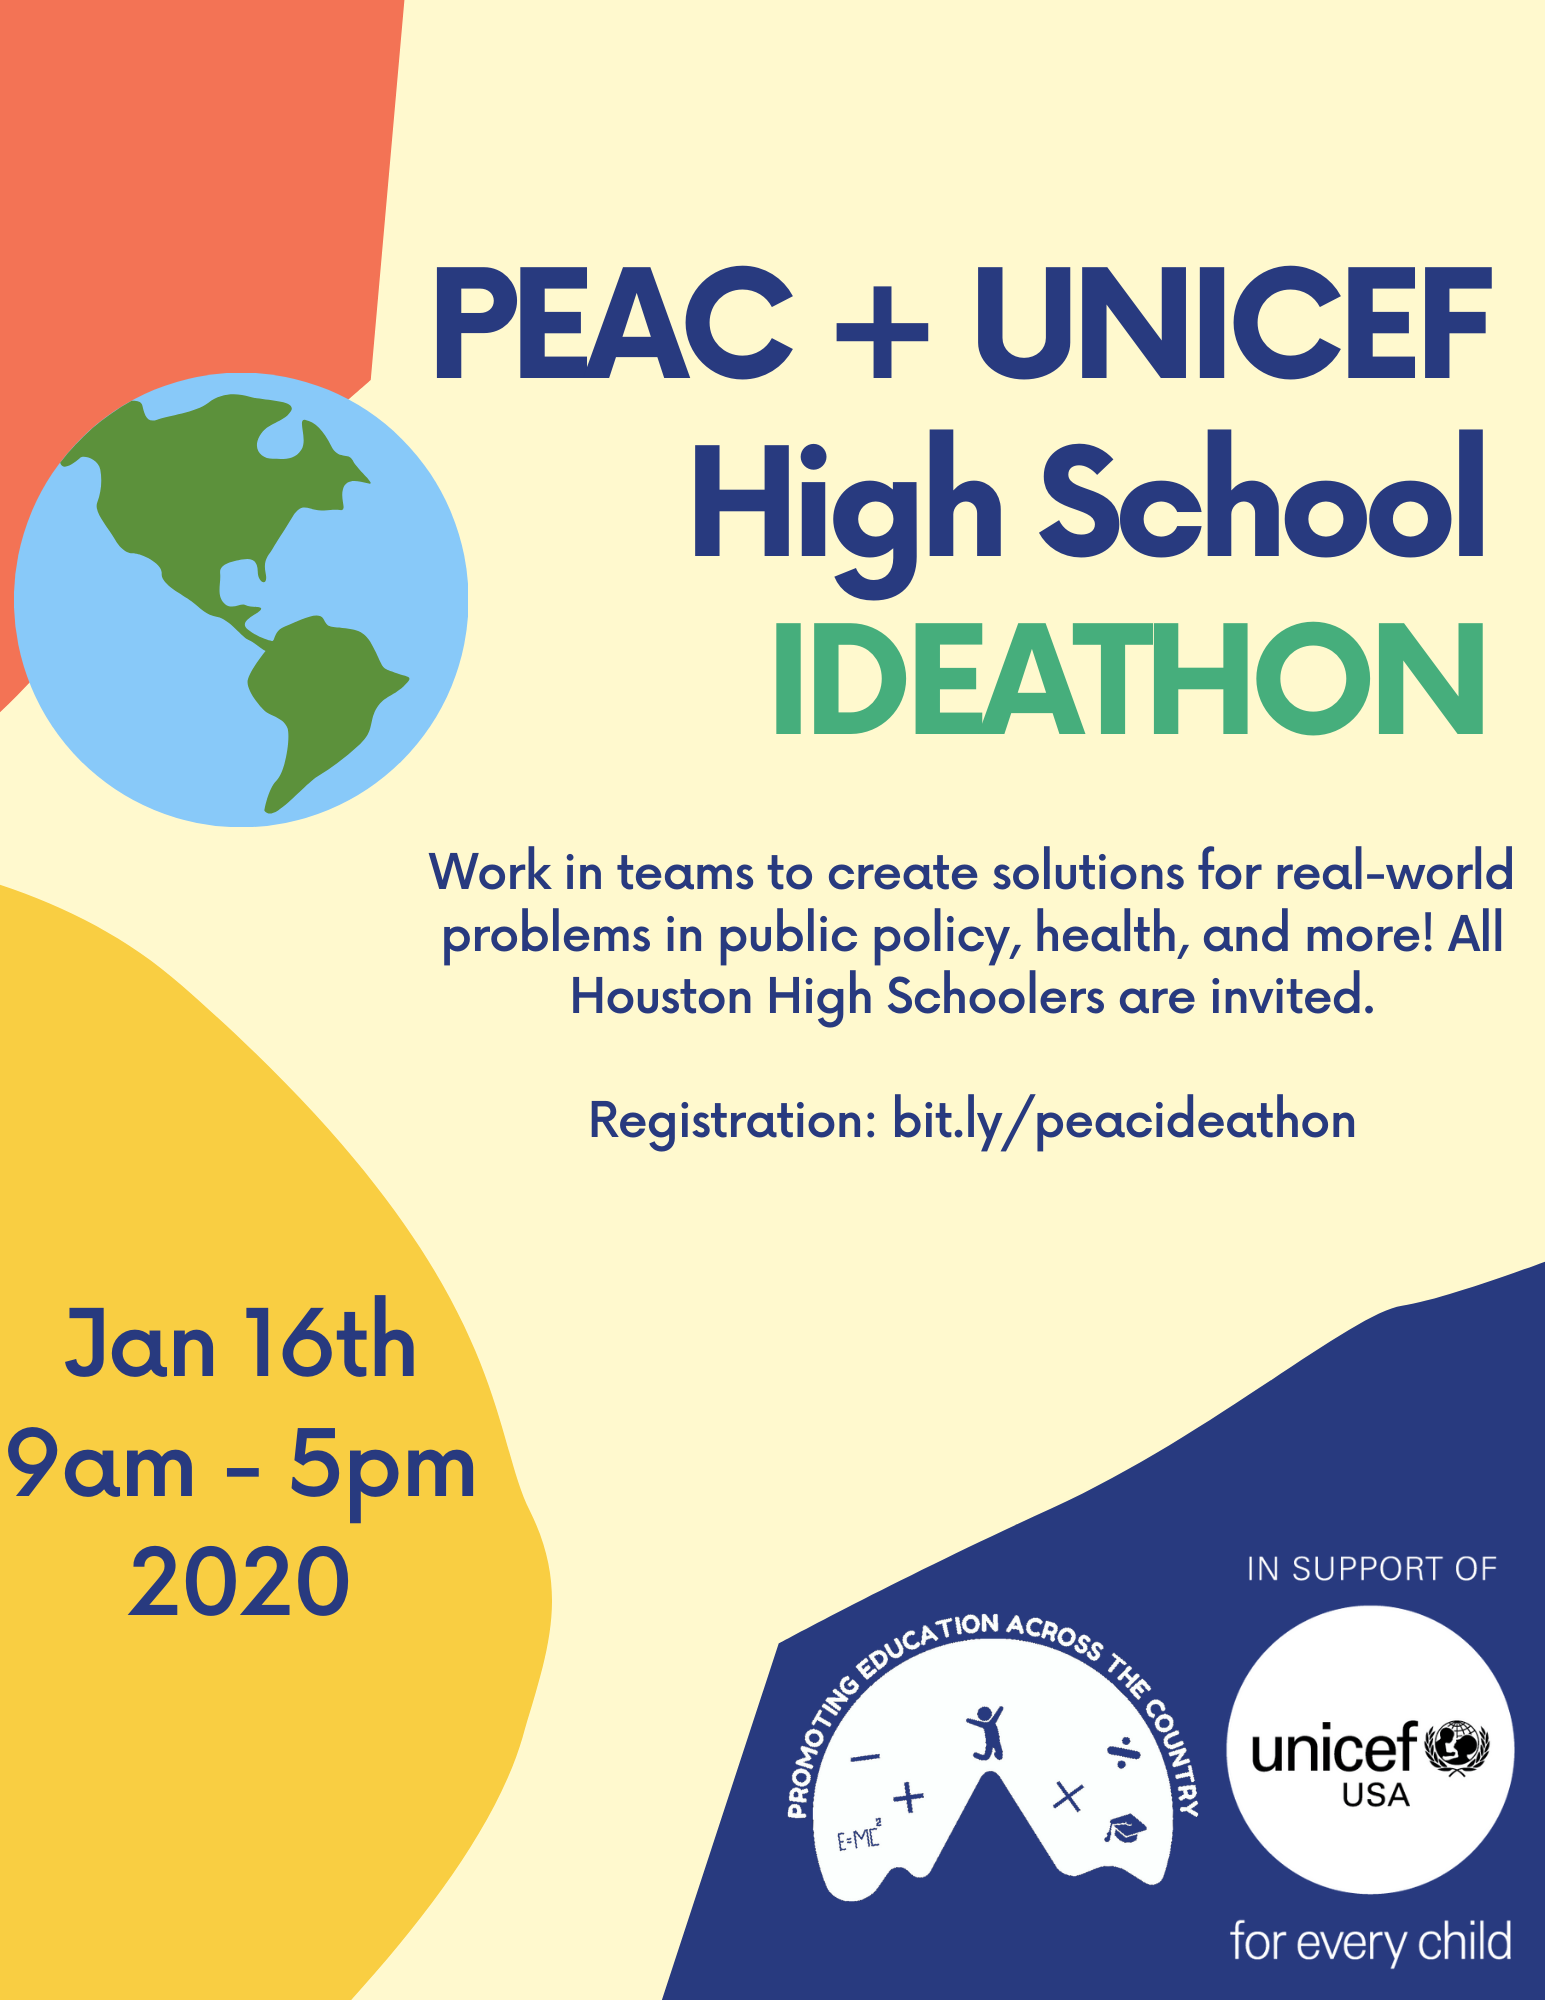 UNICEF PEAC Ideathon Day